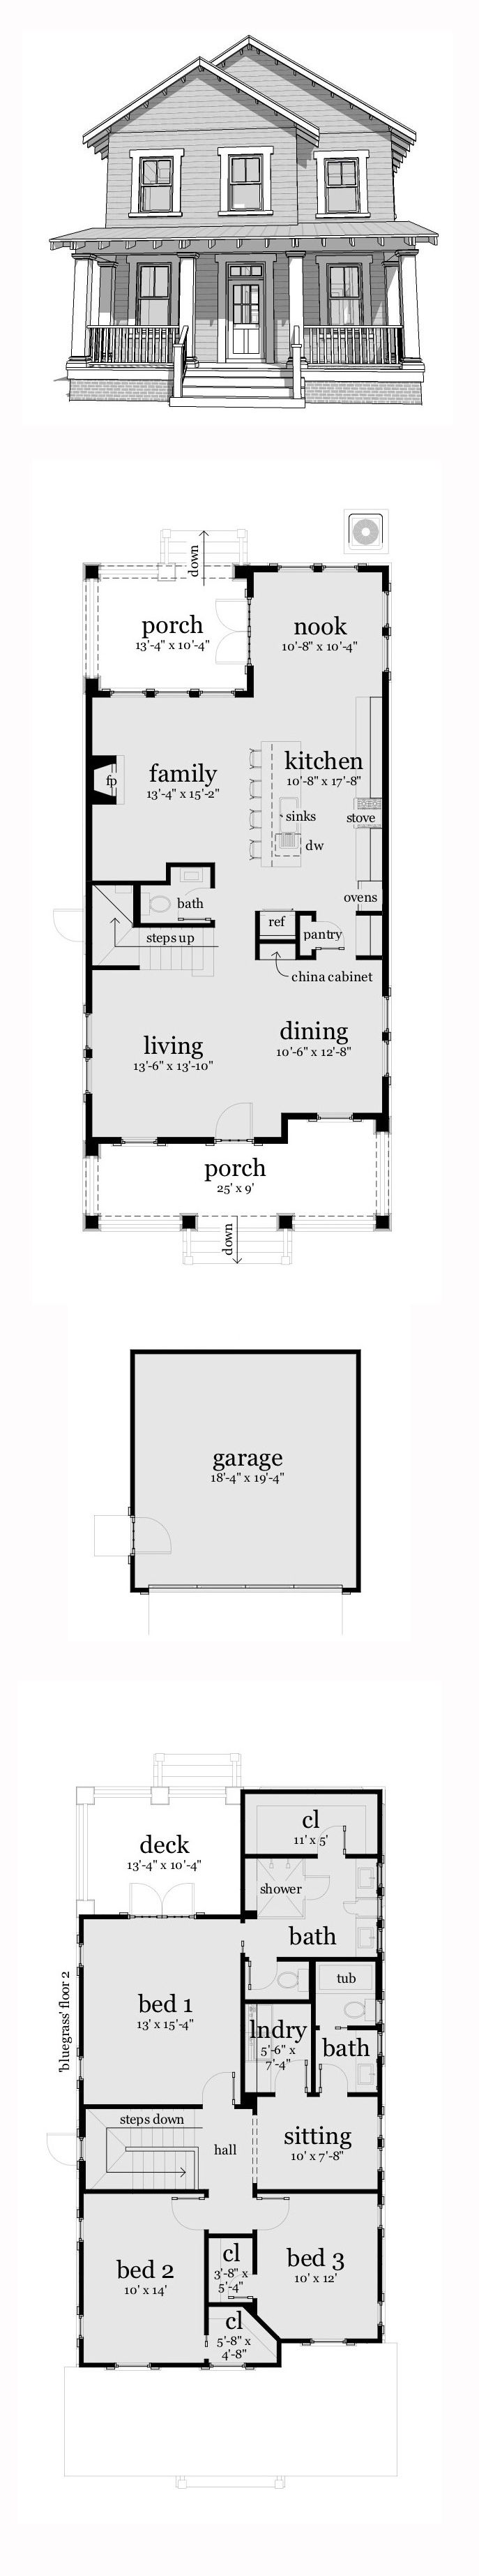 Narrow Lot House Plan 2080 sq. ft., 3 bedrooms and 2.5 bathrooms. #narrowlothome